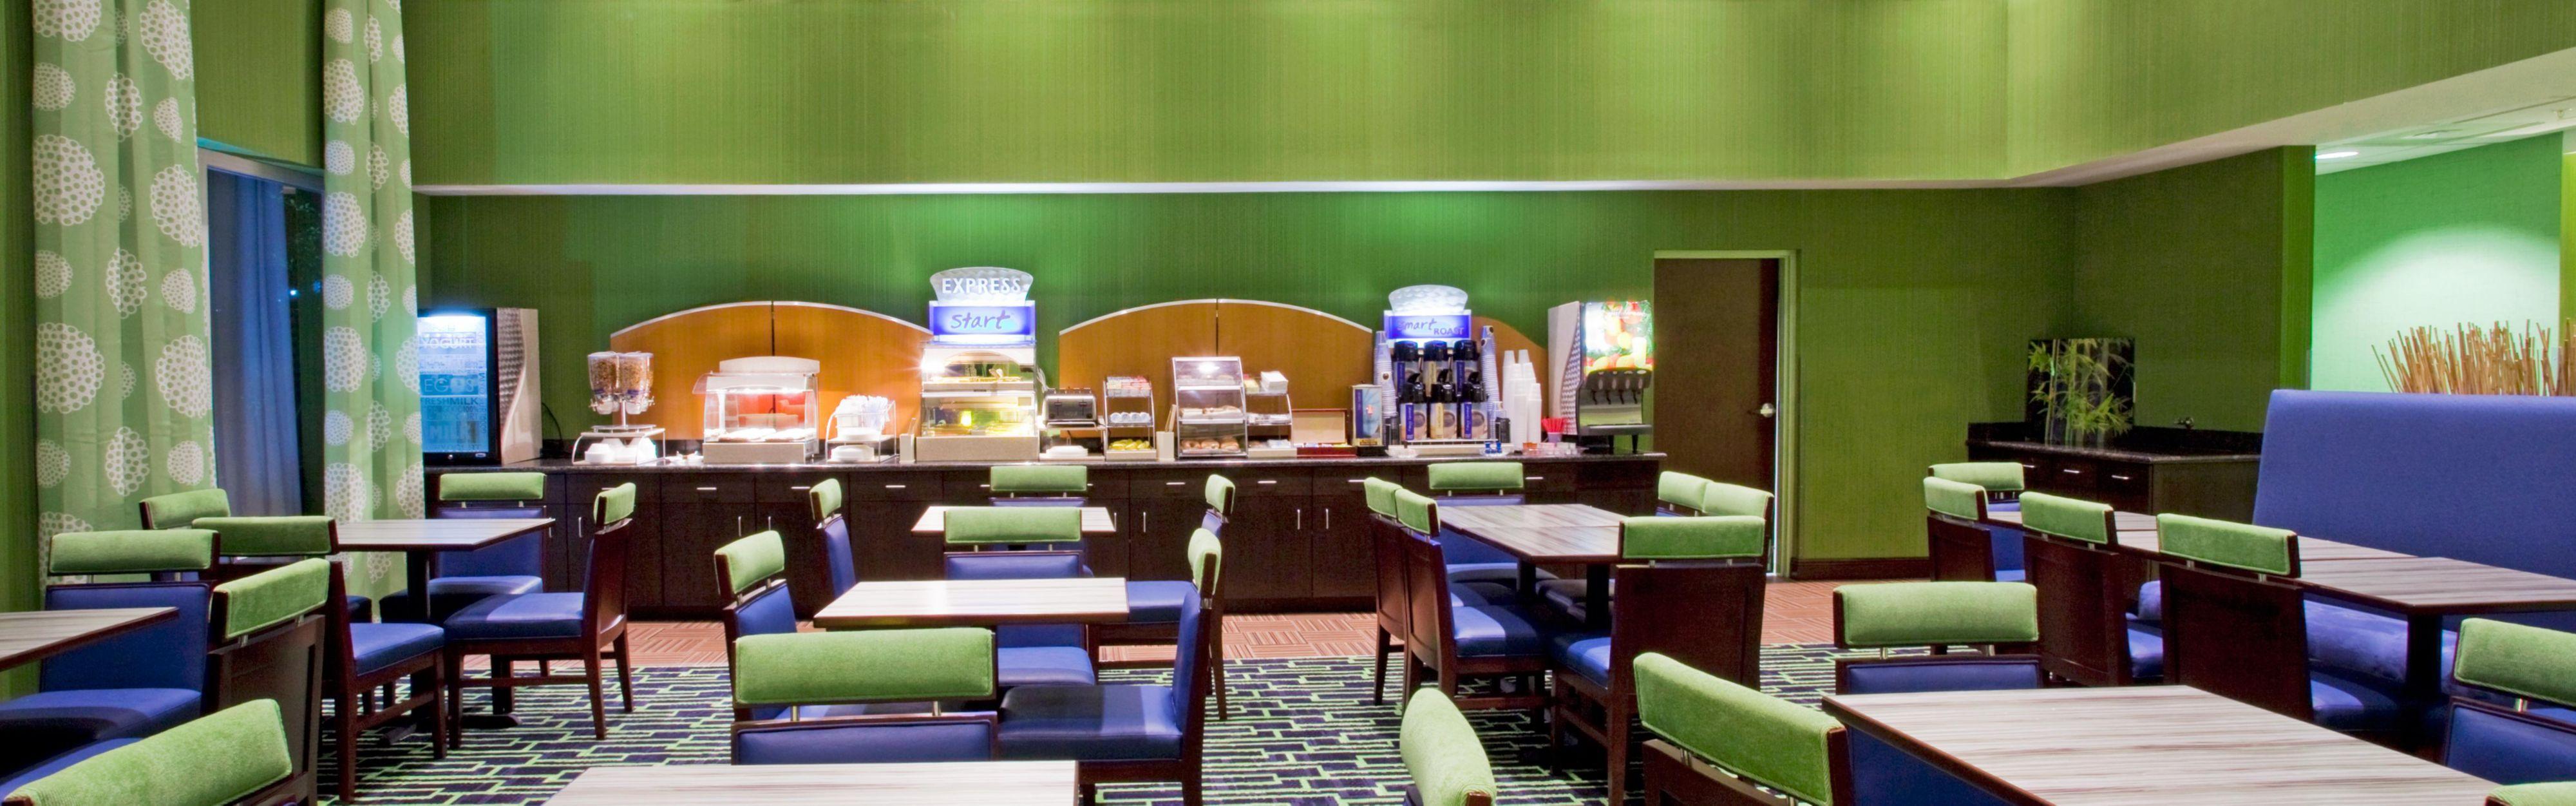 Holiday Inn Express & Suites Orlando - Apopka image 3